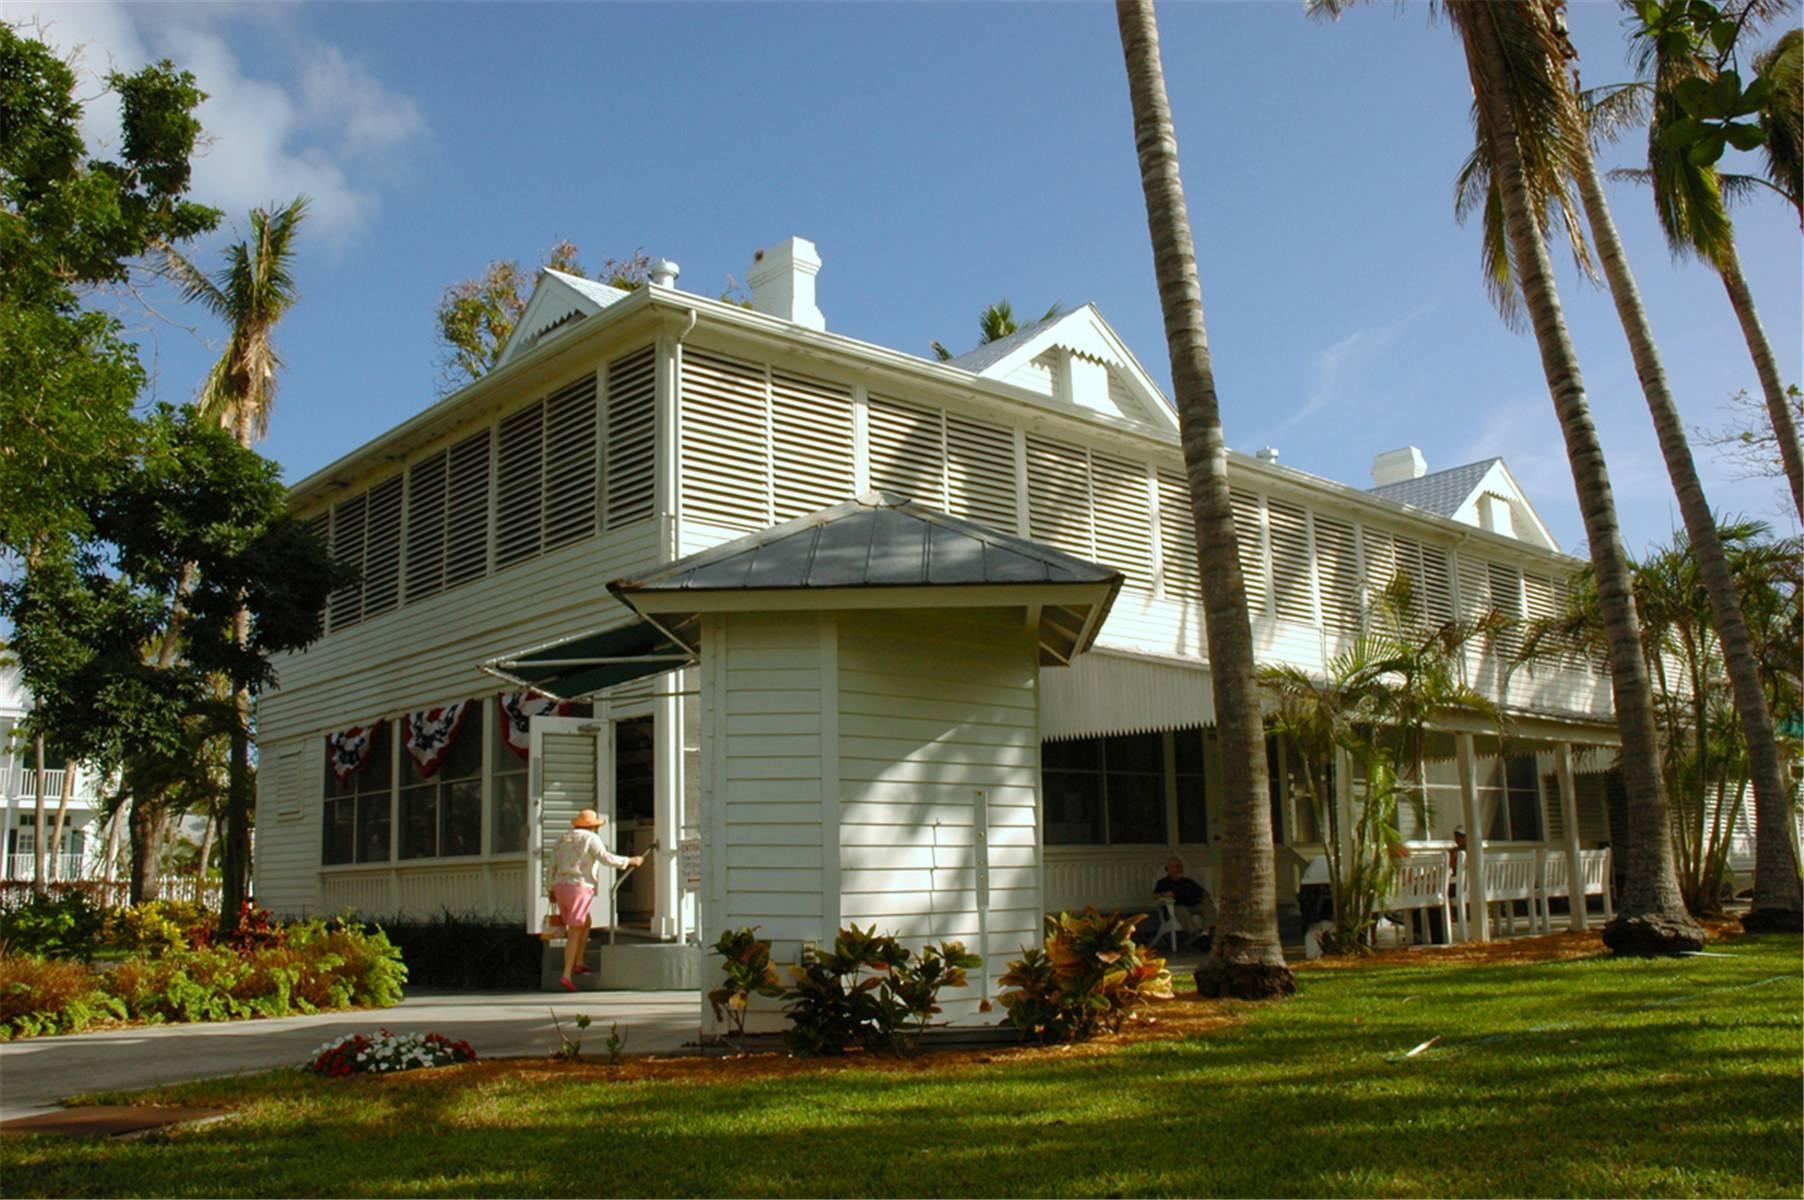 Harry S. Truman Little White House Tour